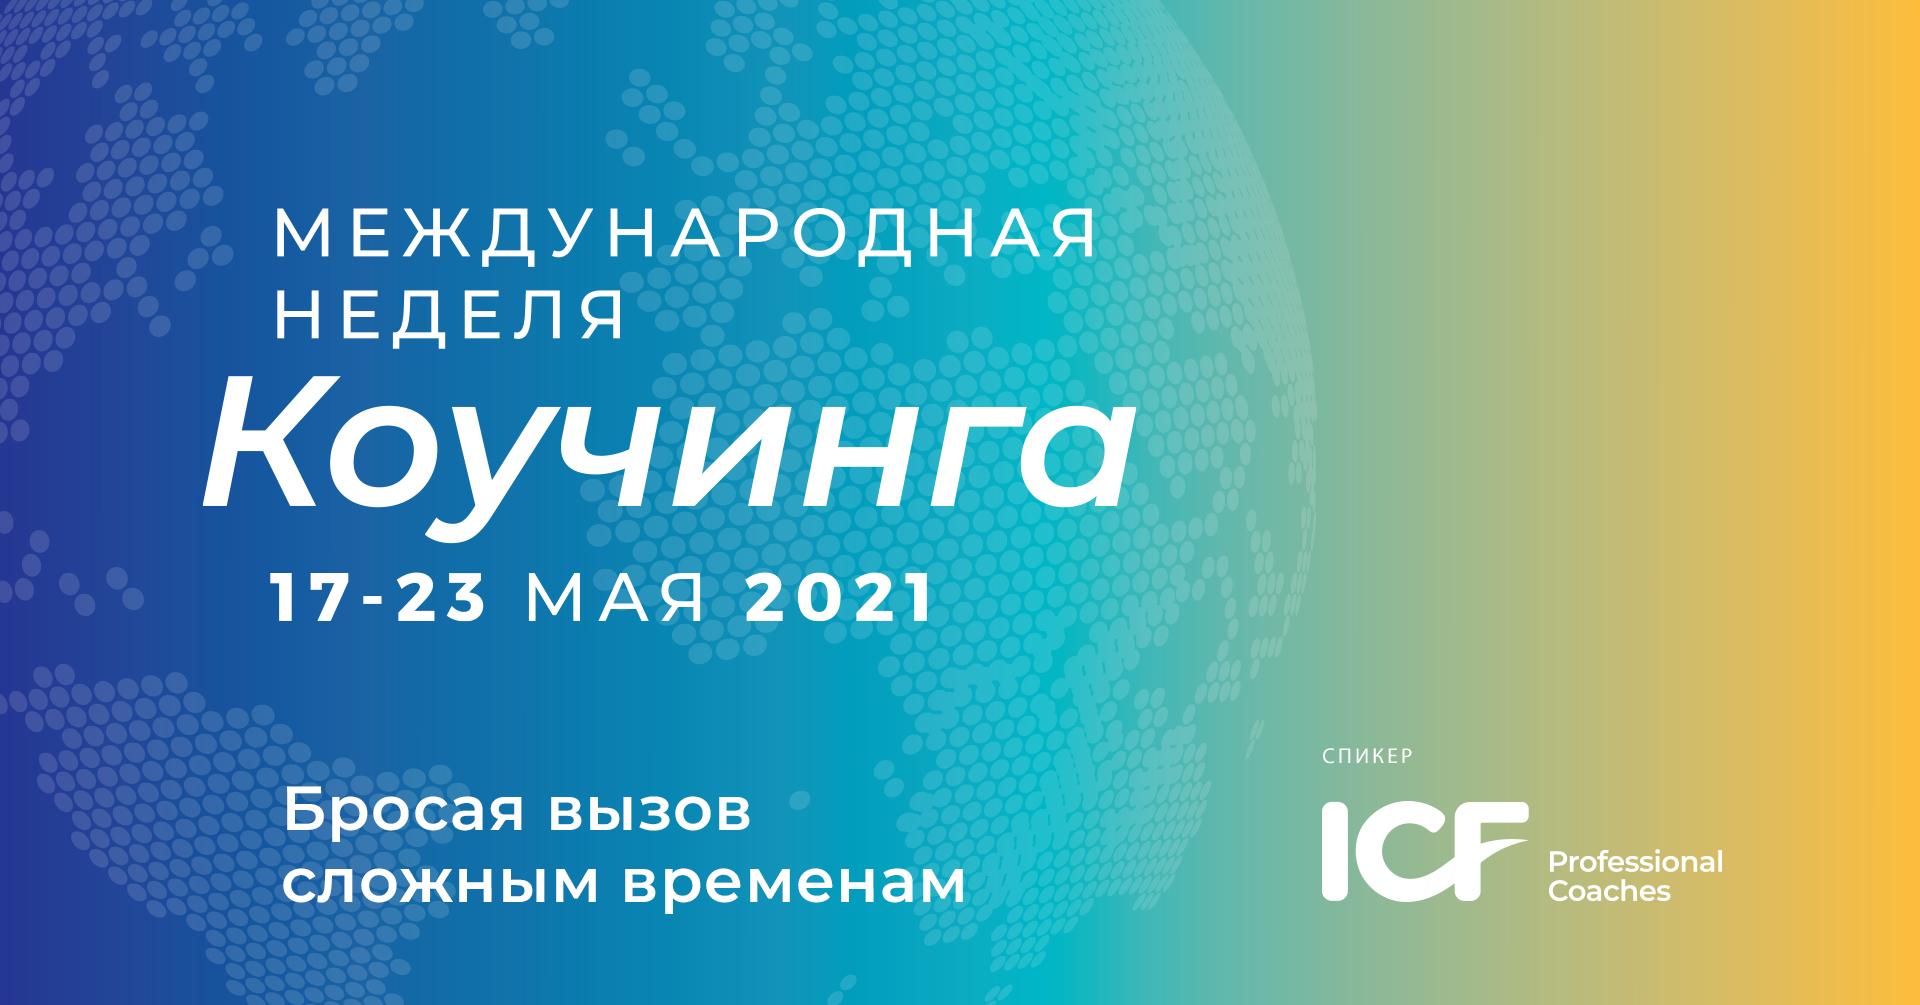 ICW Russian FBEventCoverImage